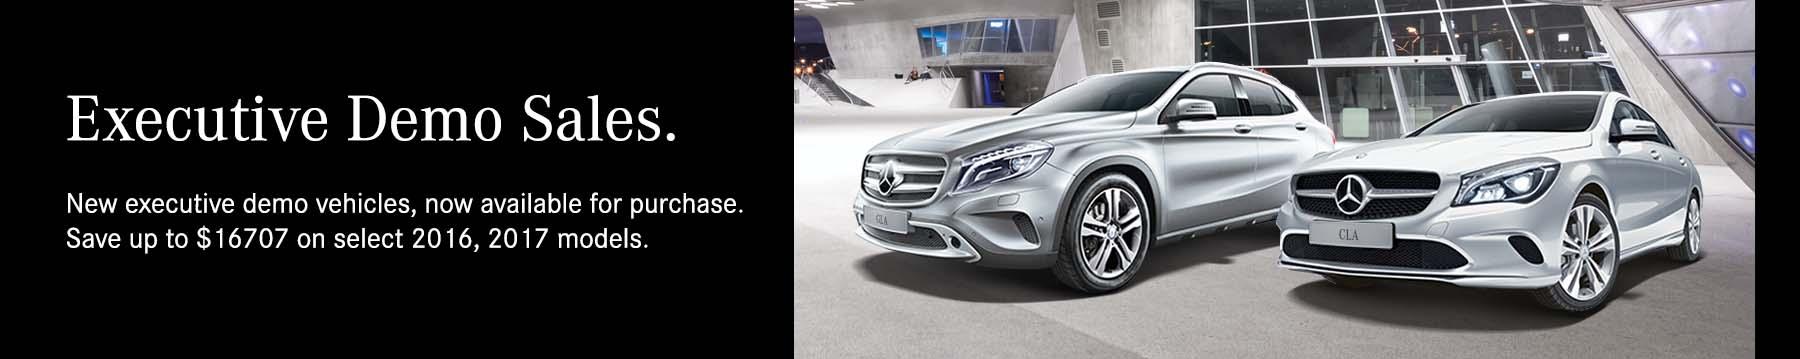 Executive demos mercedes benz winnipeg for Mercedes benz winnipeg